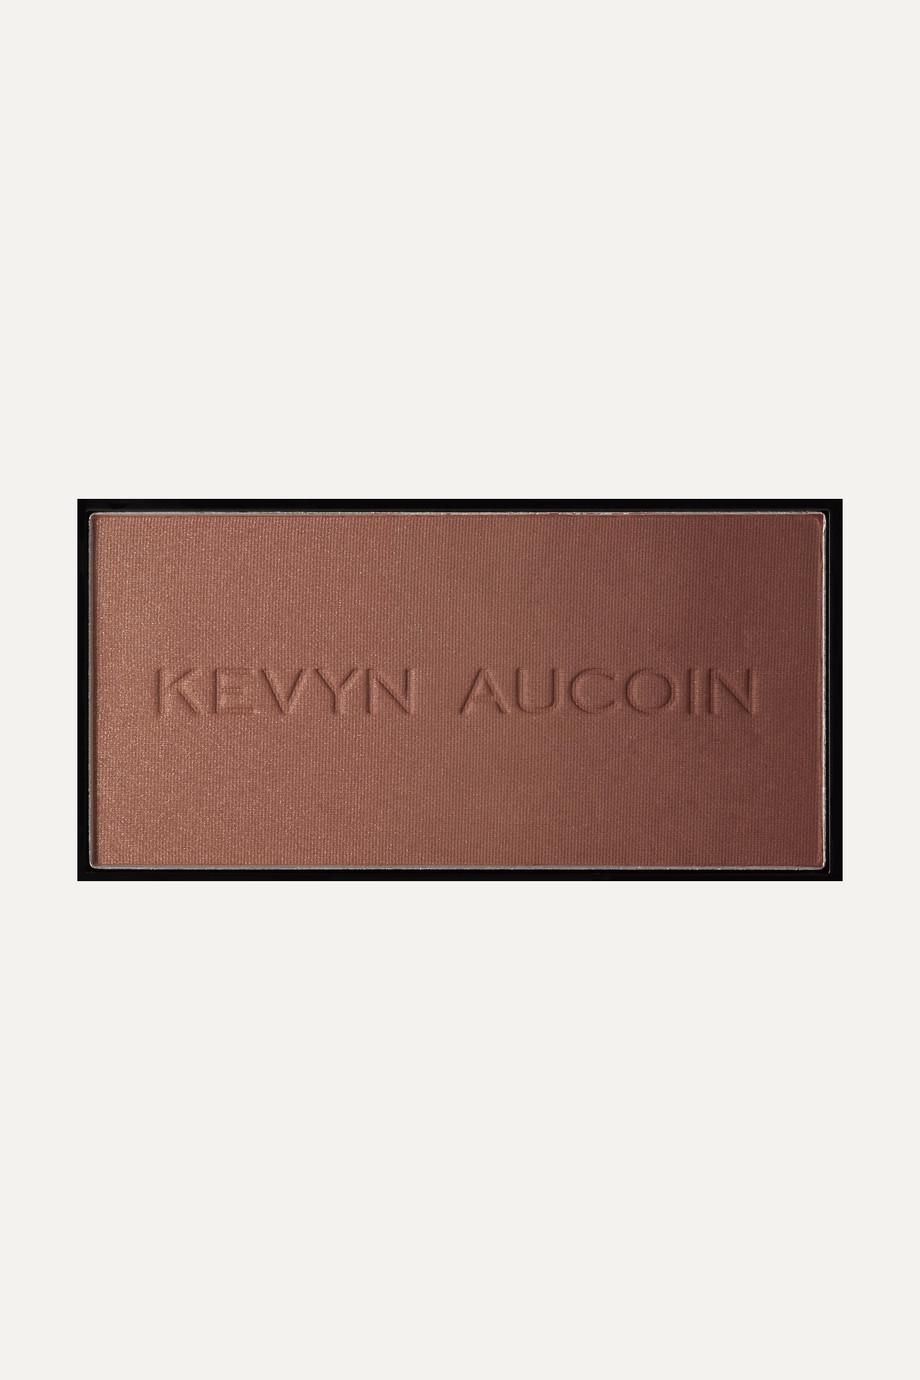 Kevyn Aucoin Poudre bronzante The Neo Bronzer, Dusk